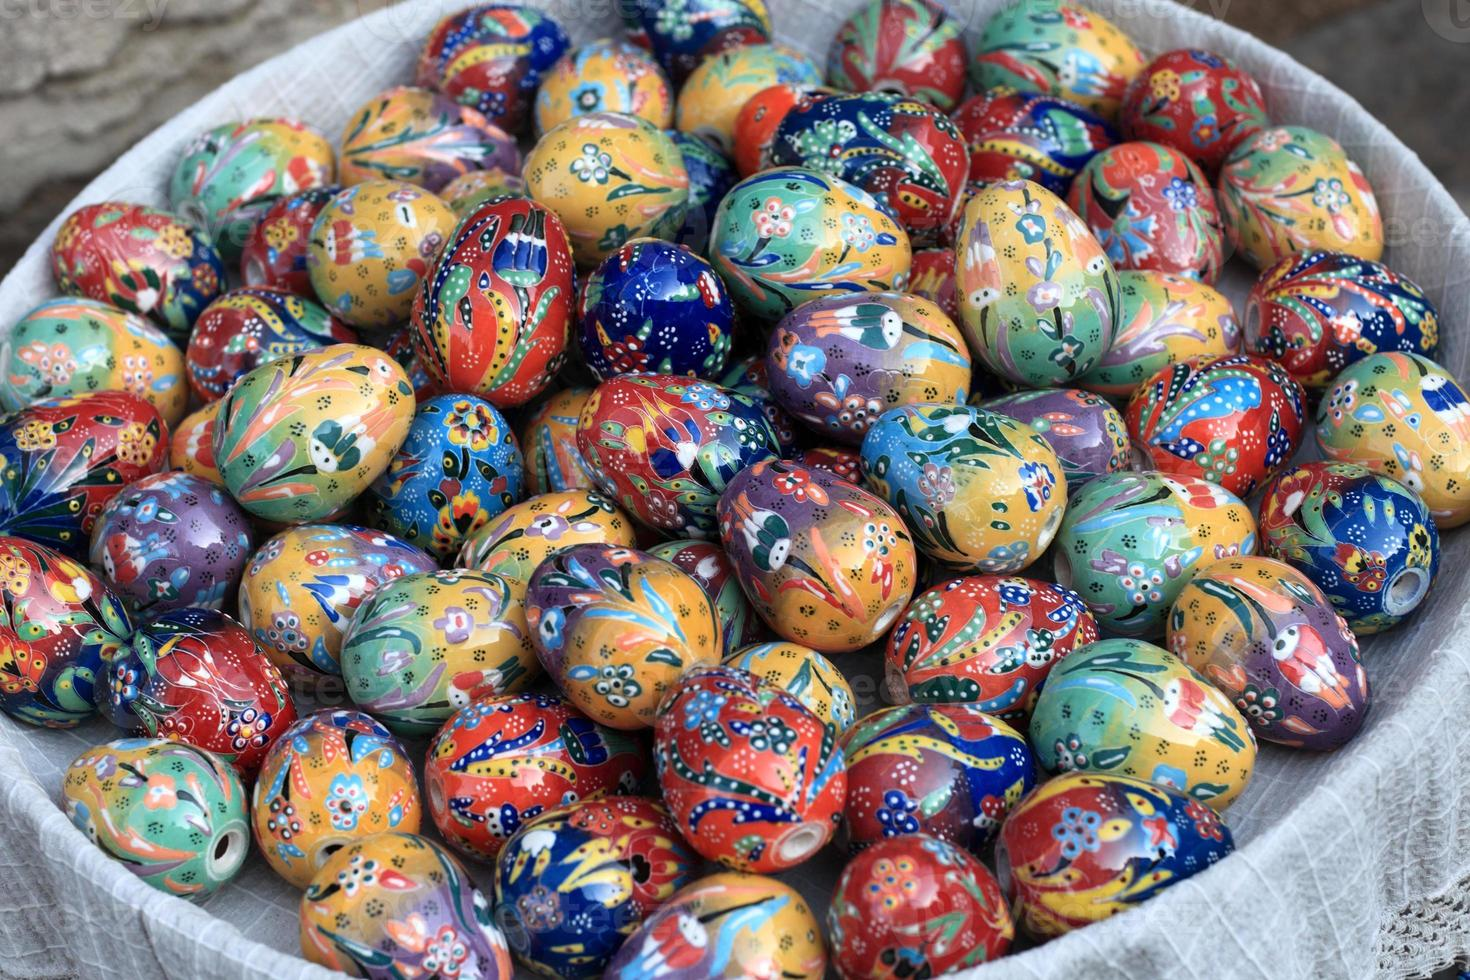 Decorative eggs photo